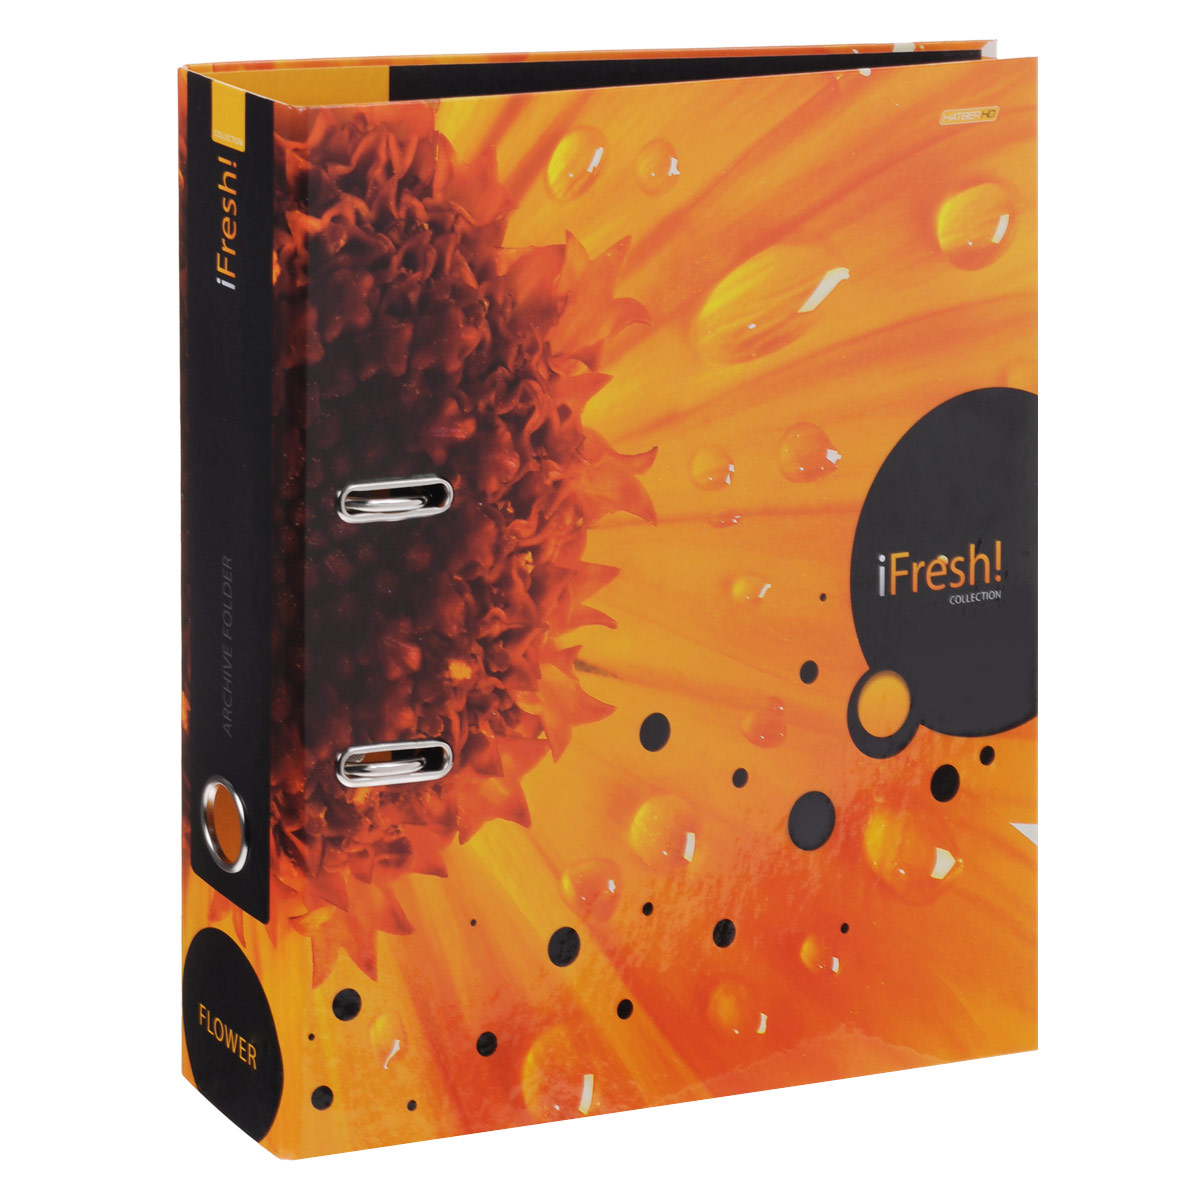 Папка-регистратор Hatber iFresh!: Цветок, цвет: оранжевый фискальный регистратор атол fprint 22птк без фн white